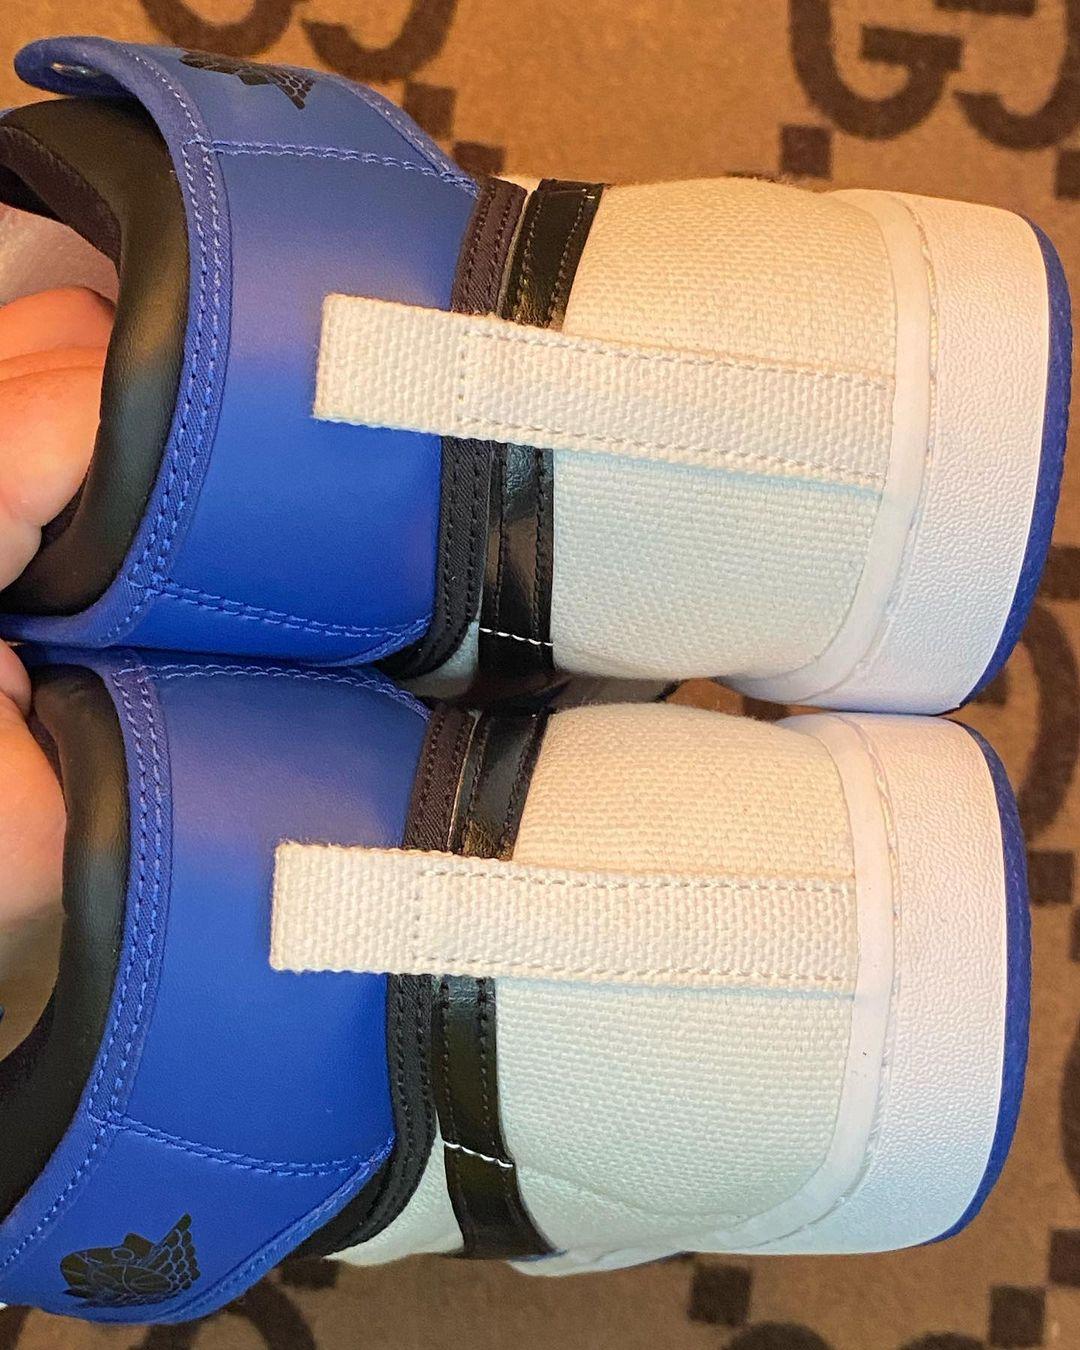 Air Jordan 1 KO,Storm Blue,AJ1  酷似「闪电」配色!全新 AJ1 KO 实物曝光!